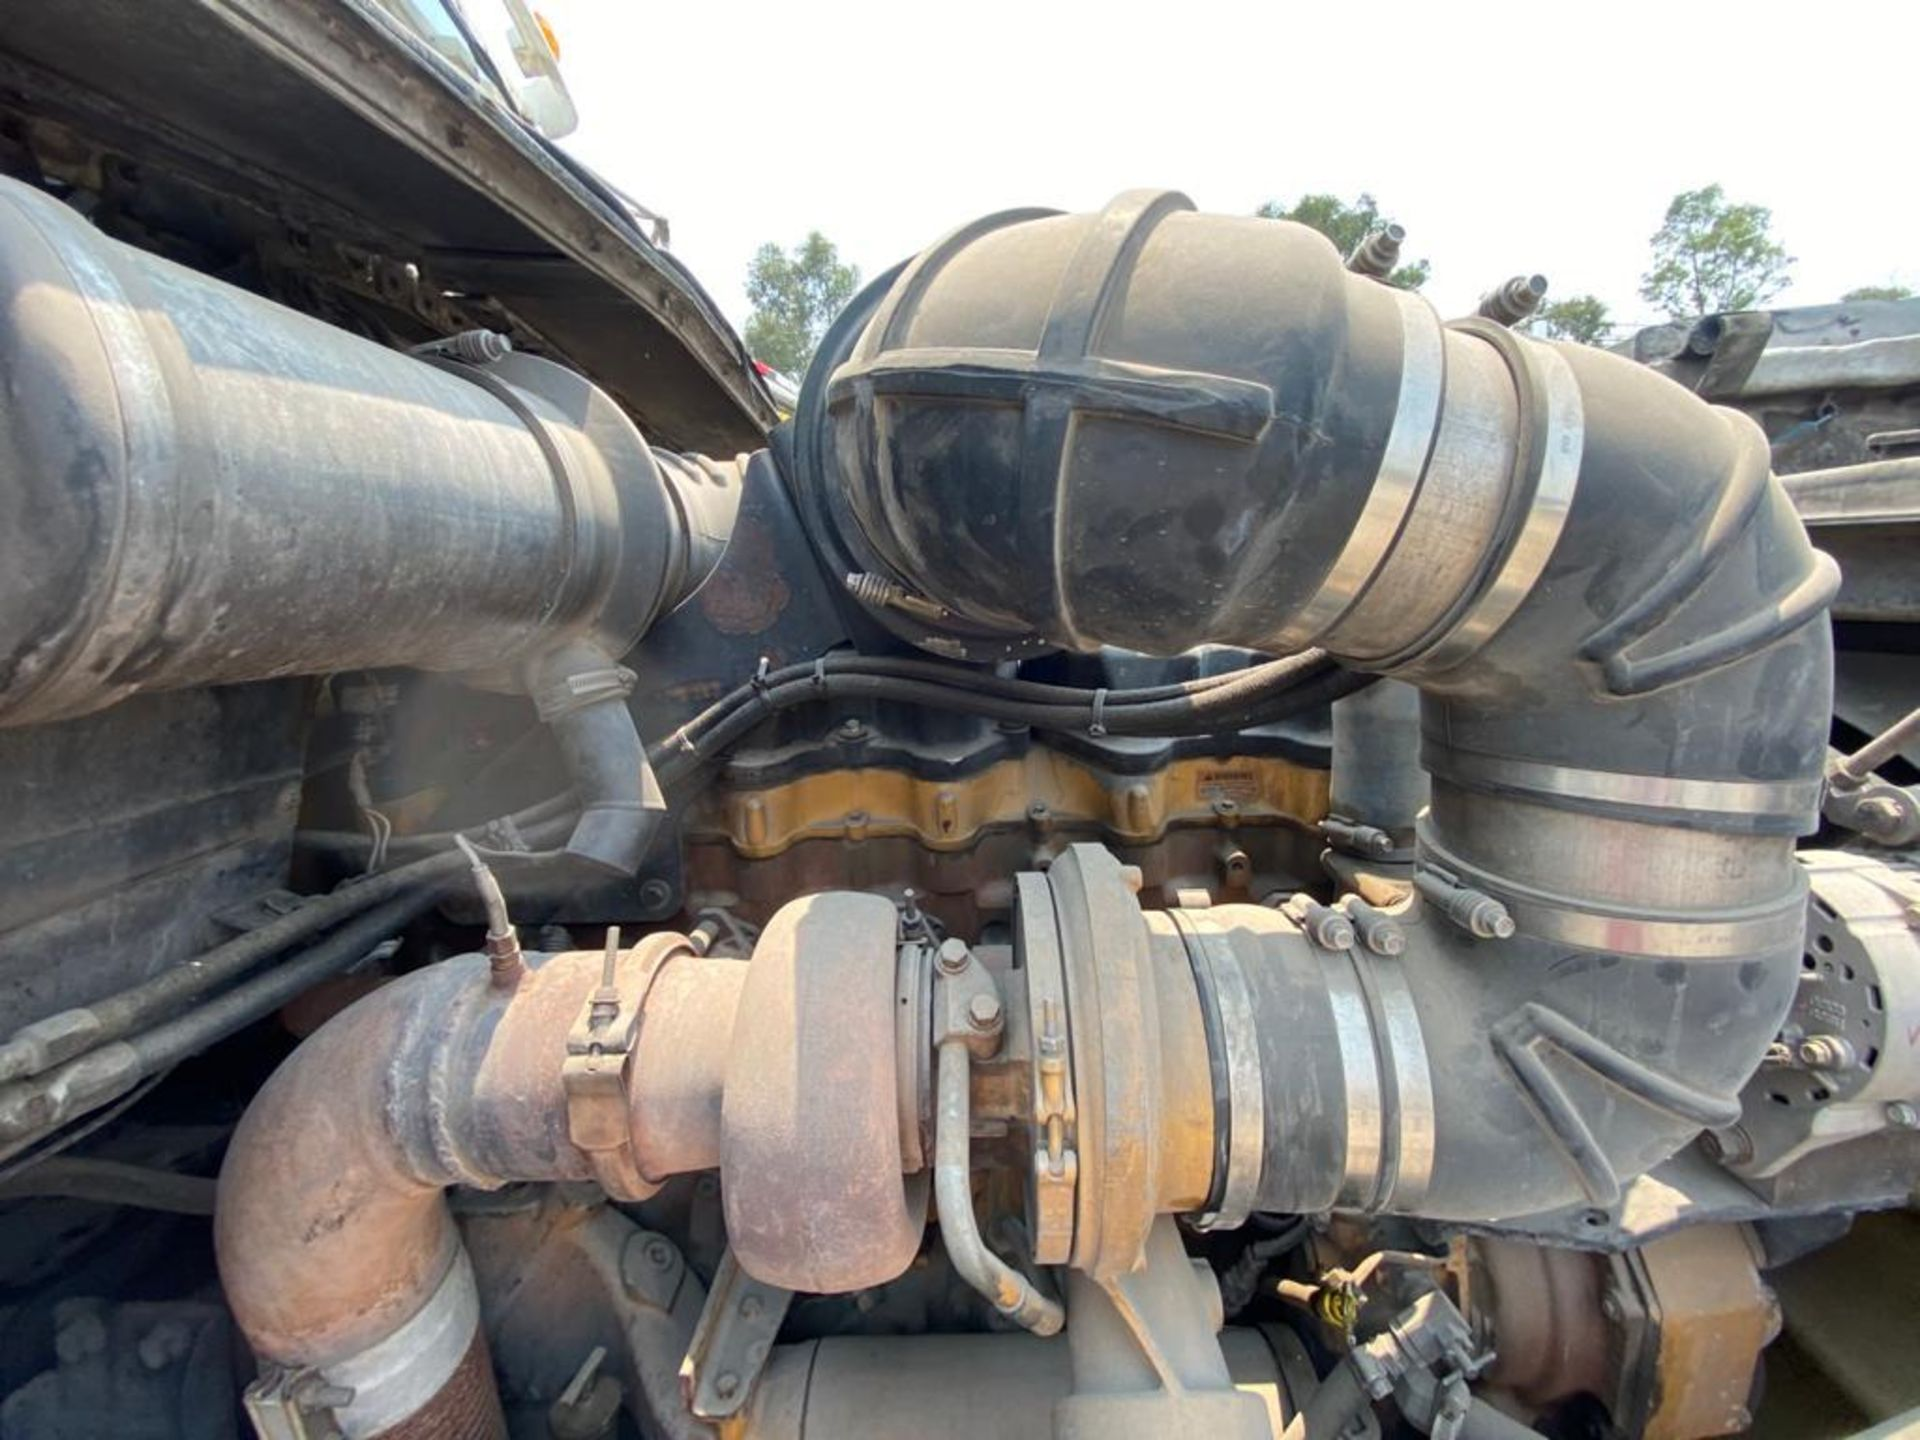 1999 Kenworth Sleeper truck tractor, standard transmission of 18 speeds - Image 64 of 70